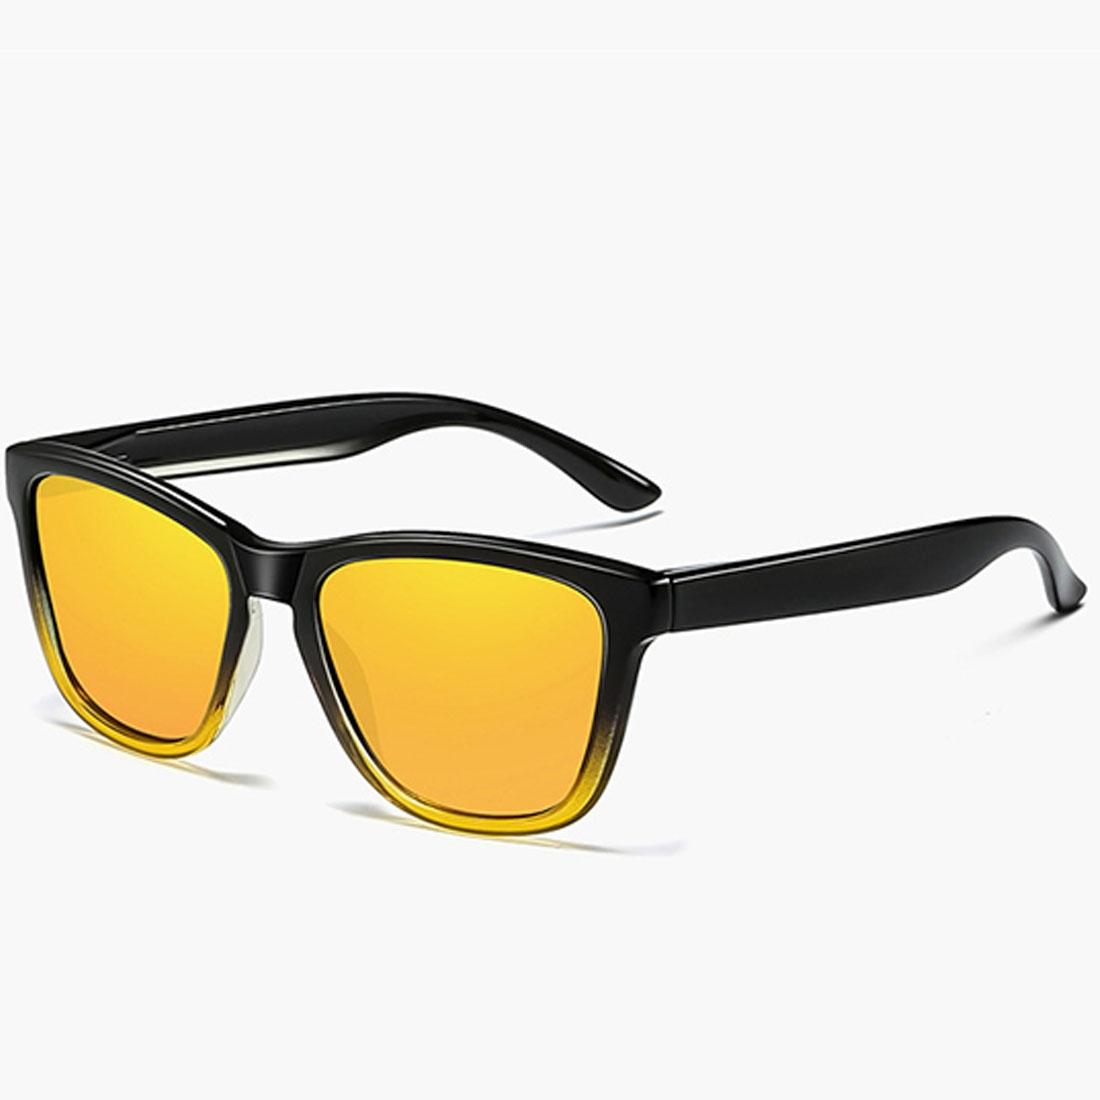 Unisex Retro Fashion Plastic Frame UV400 Polarized Sunglasses (Gradient Black + Yellow)